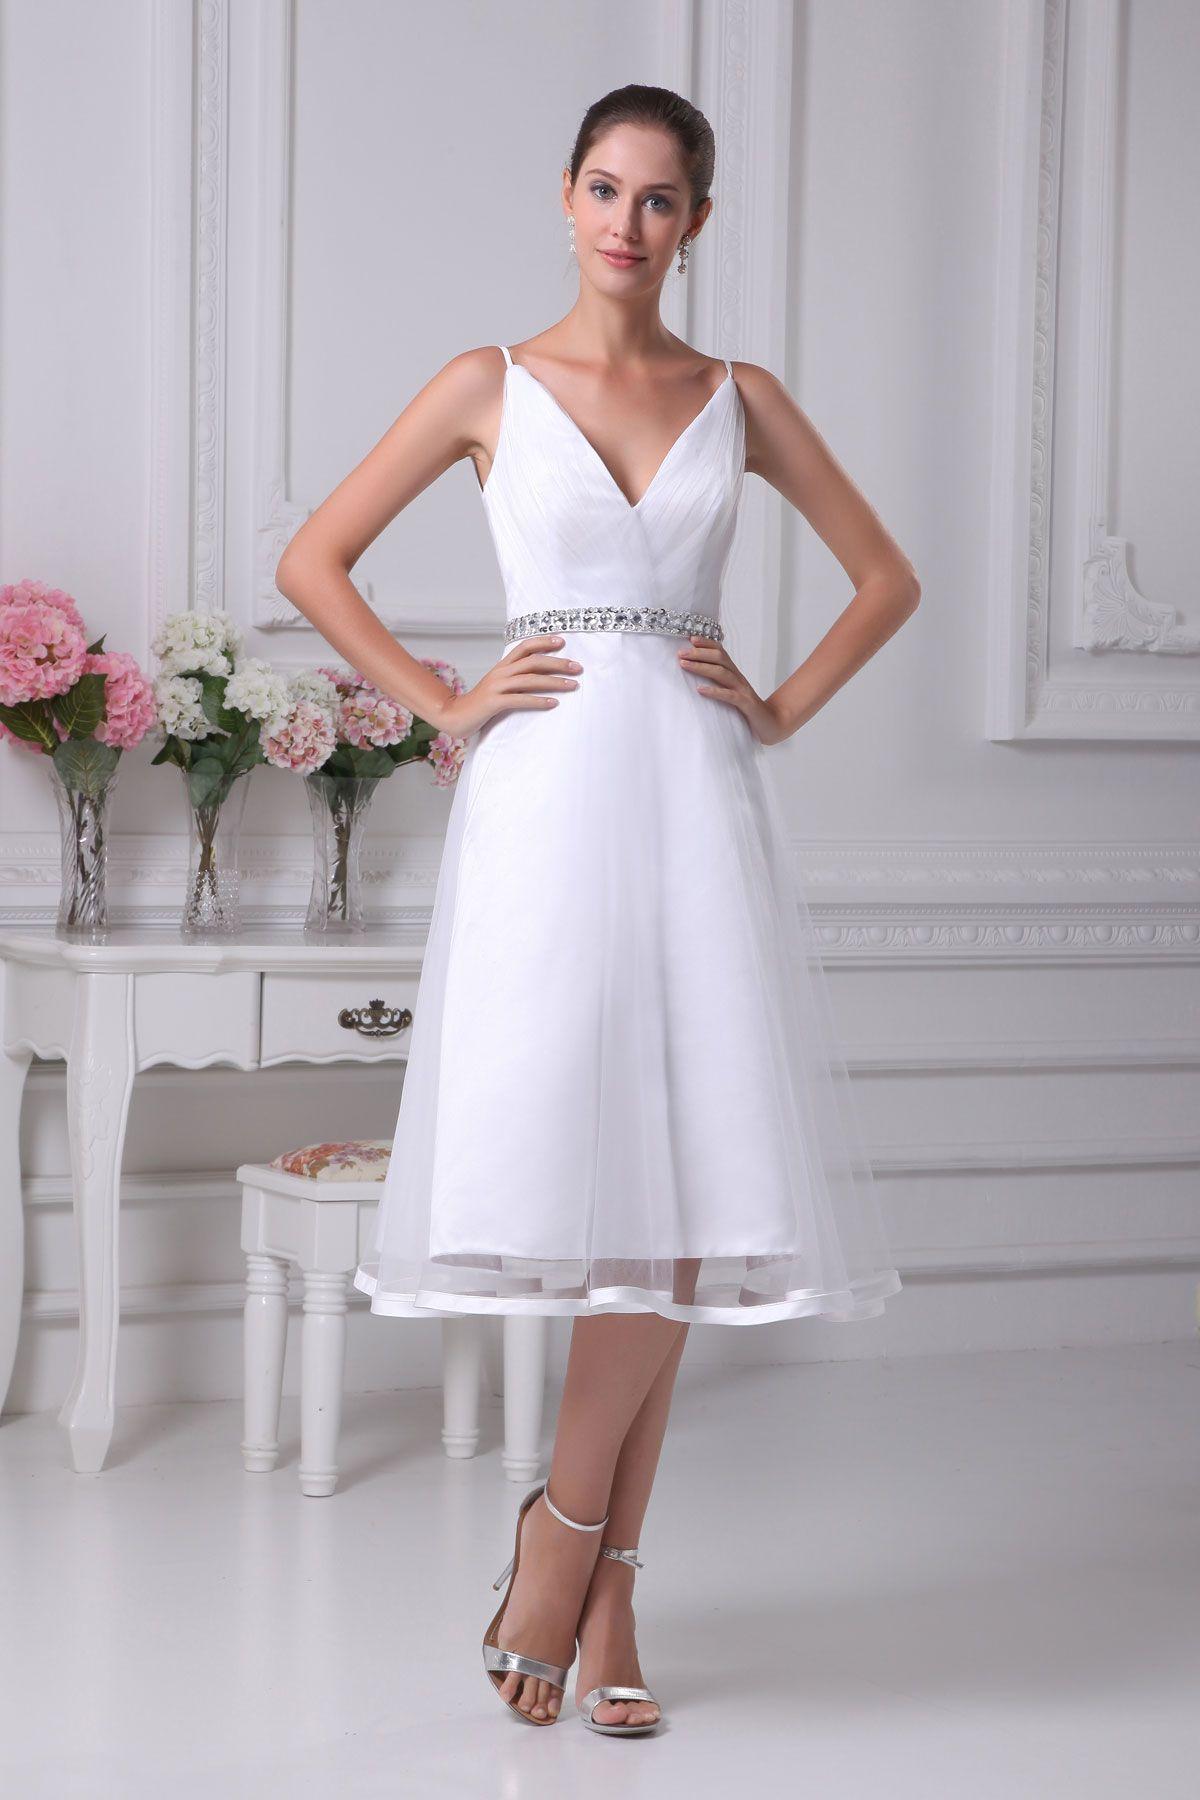 Princess white organza tealength vneck wedding dress wedding